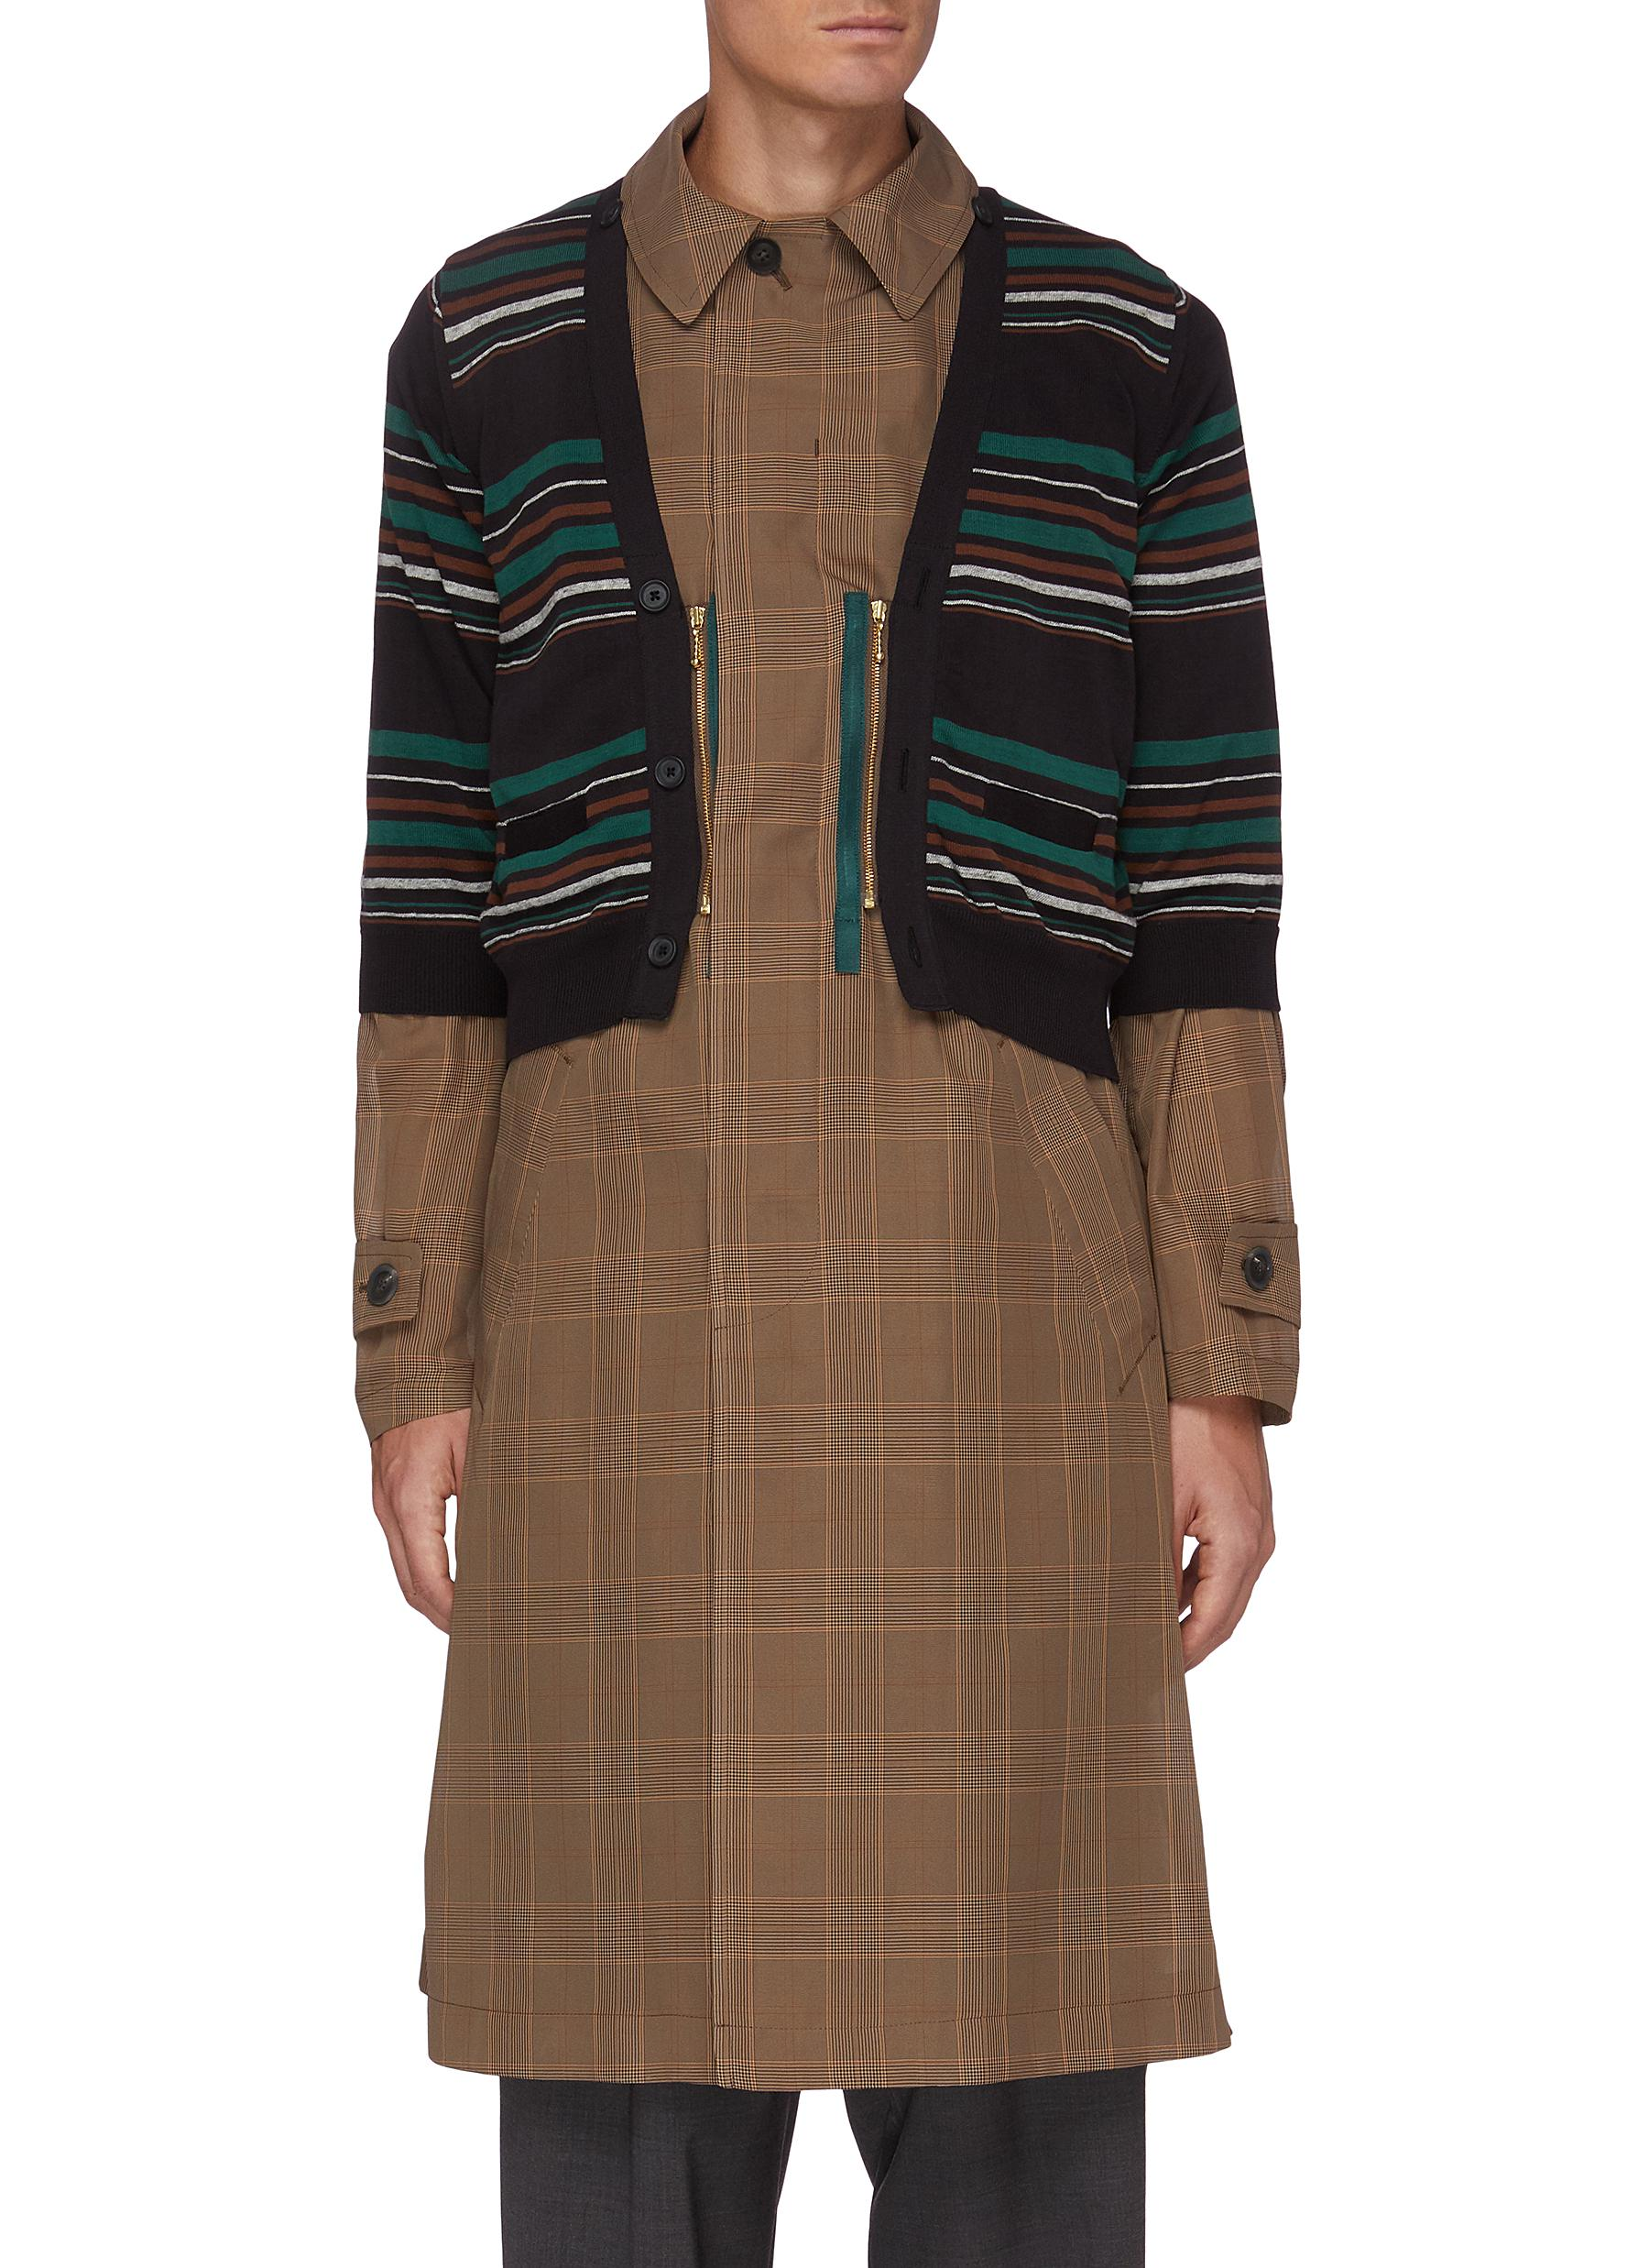 Striped Cardigan Overlay Glen Check Long Coat - KOLOR - Modalova